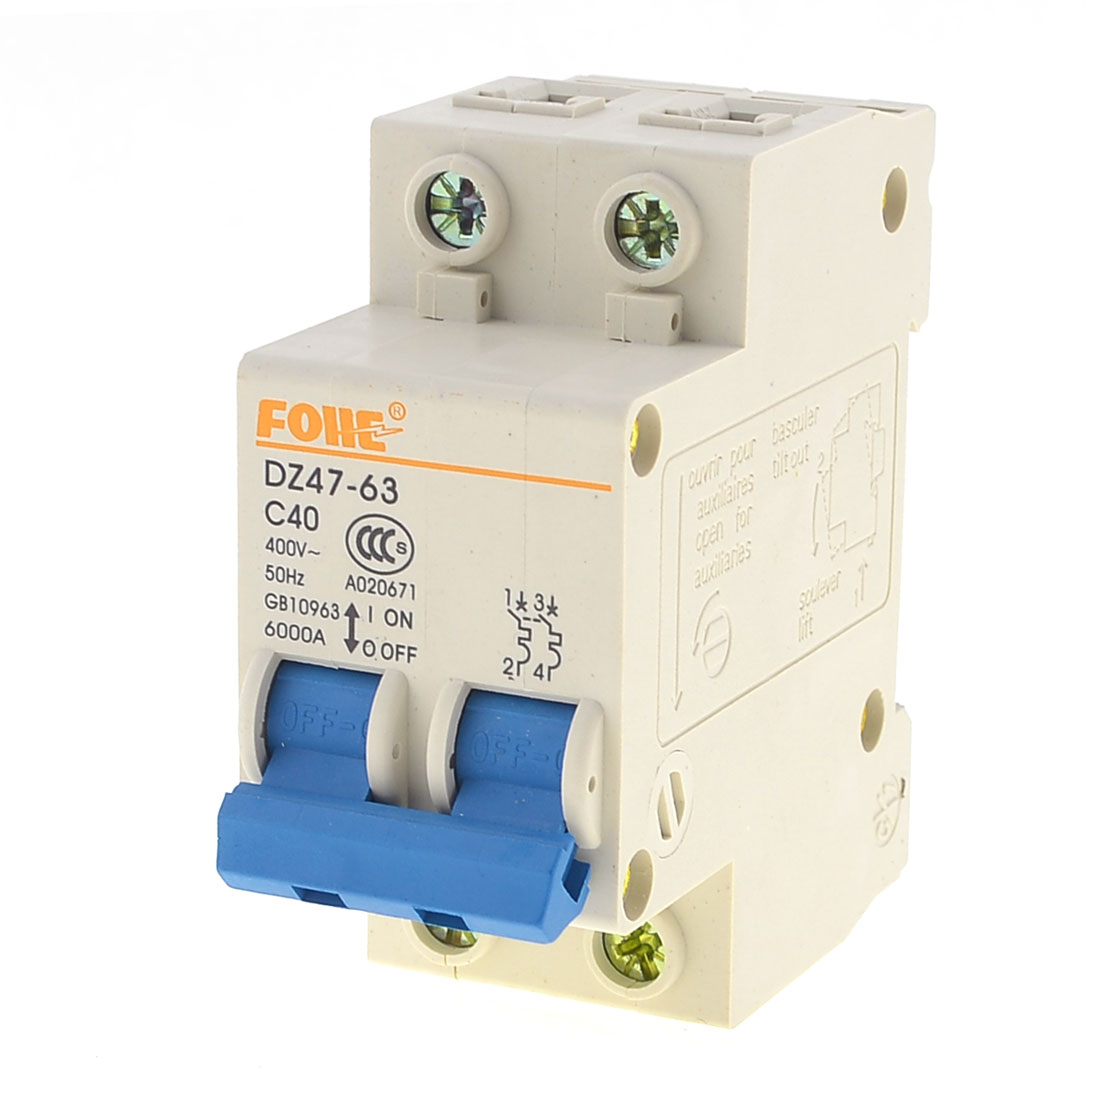 AC 400V 40A 2P Plastic Housing Short Circuit Breaker Protector DZ47-63